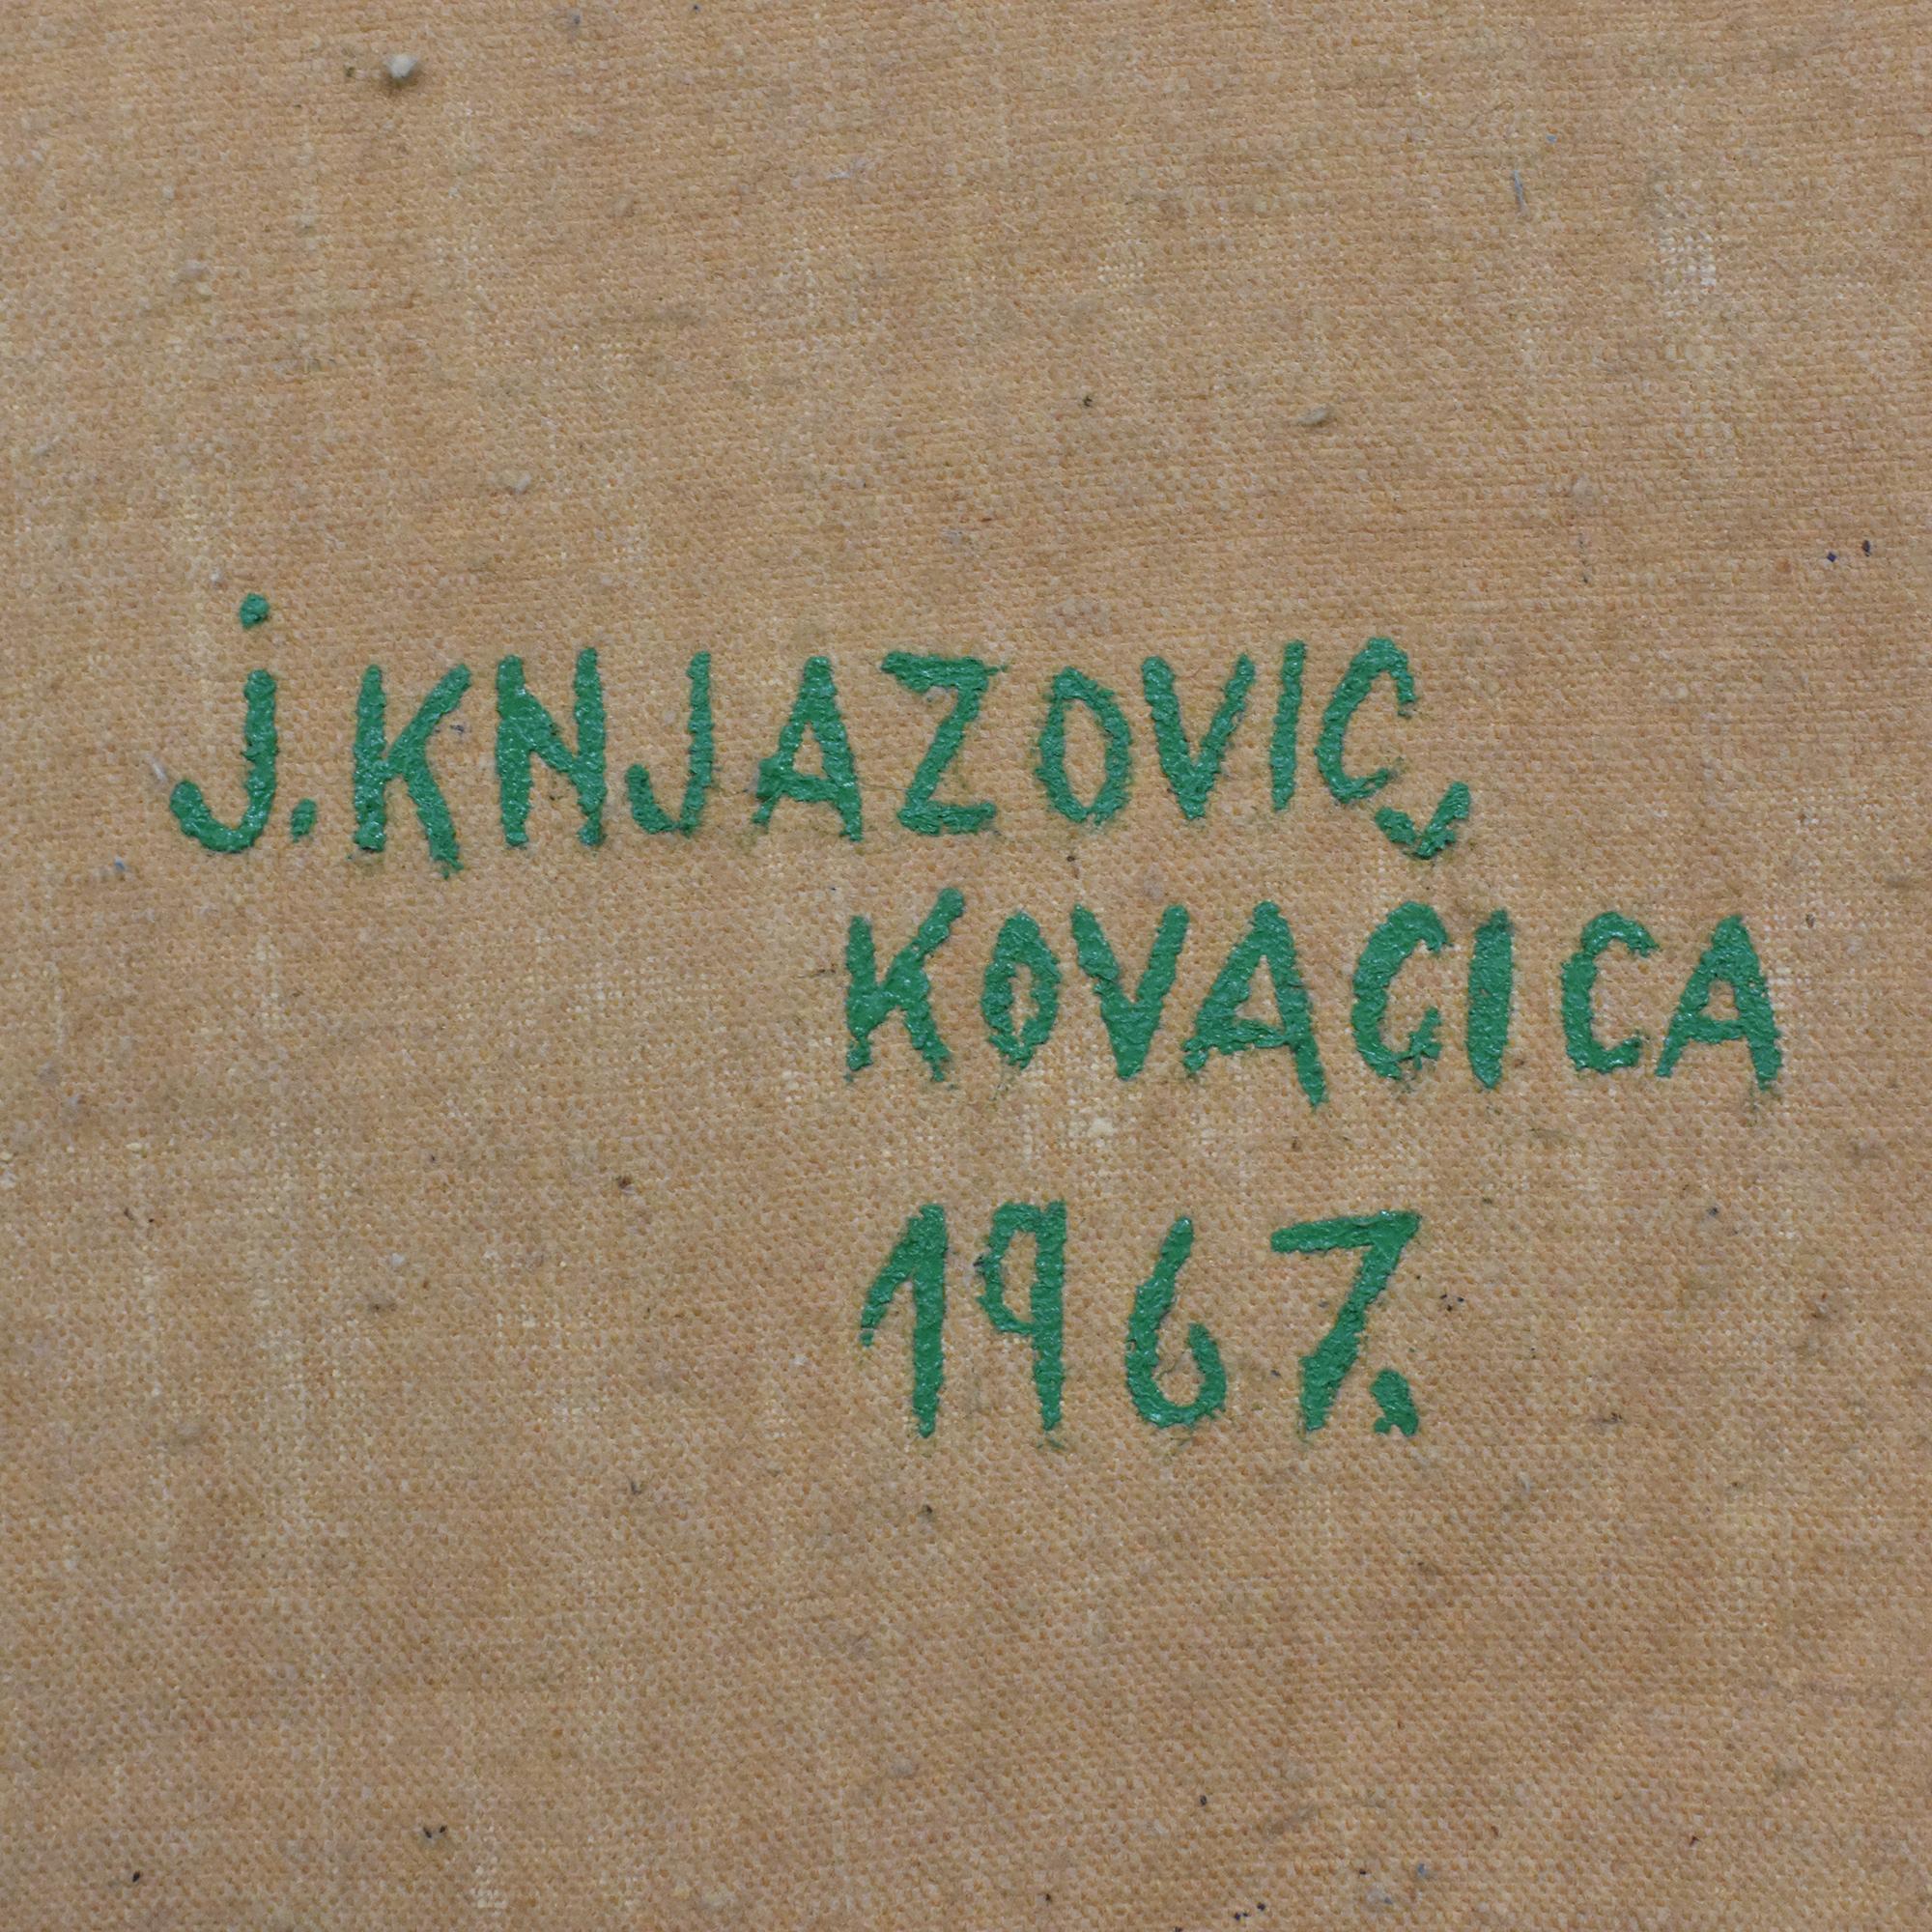 Jan Knjazovic Framed Chicken Painting on sale